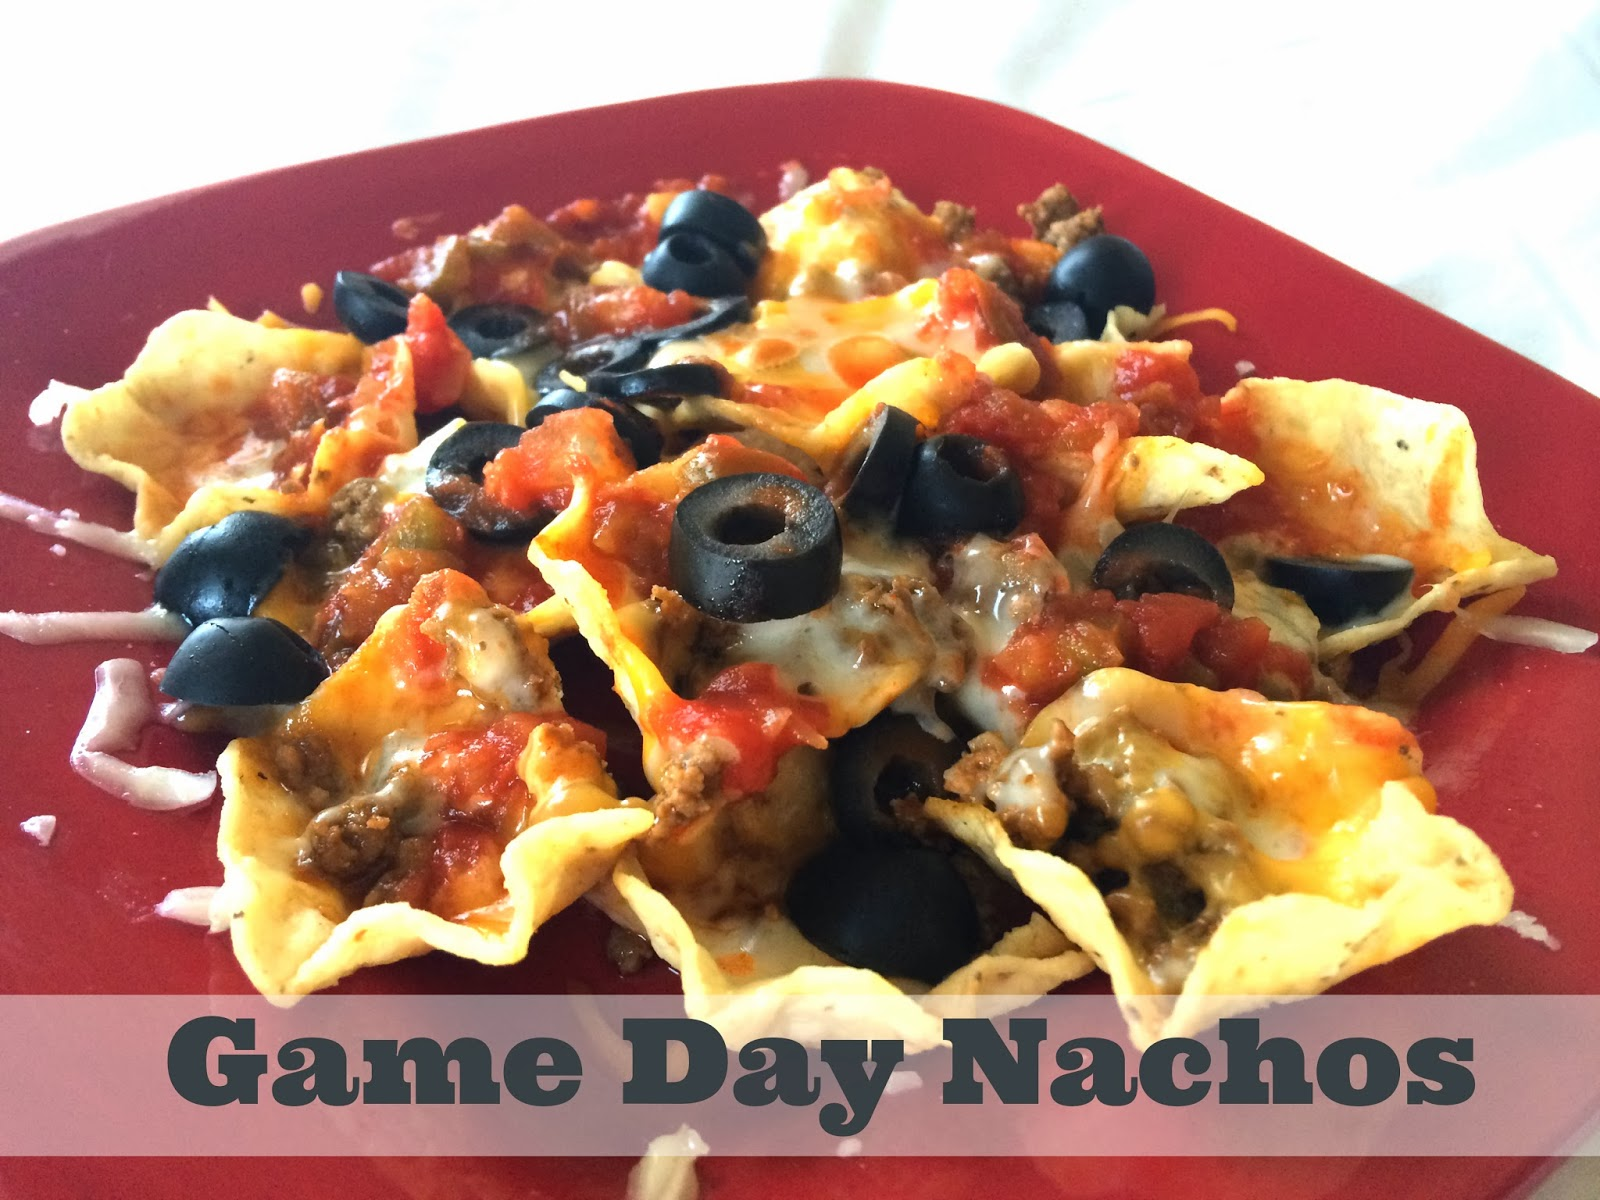 http://www.thisbeautifullifeblog.com/2014/01/game-day-nachos.html